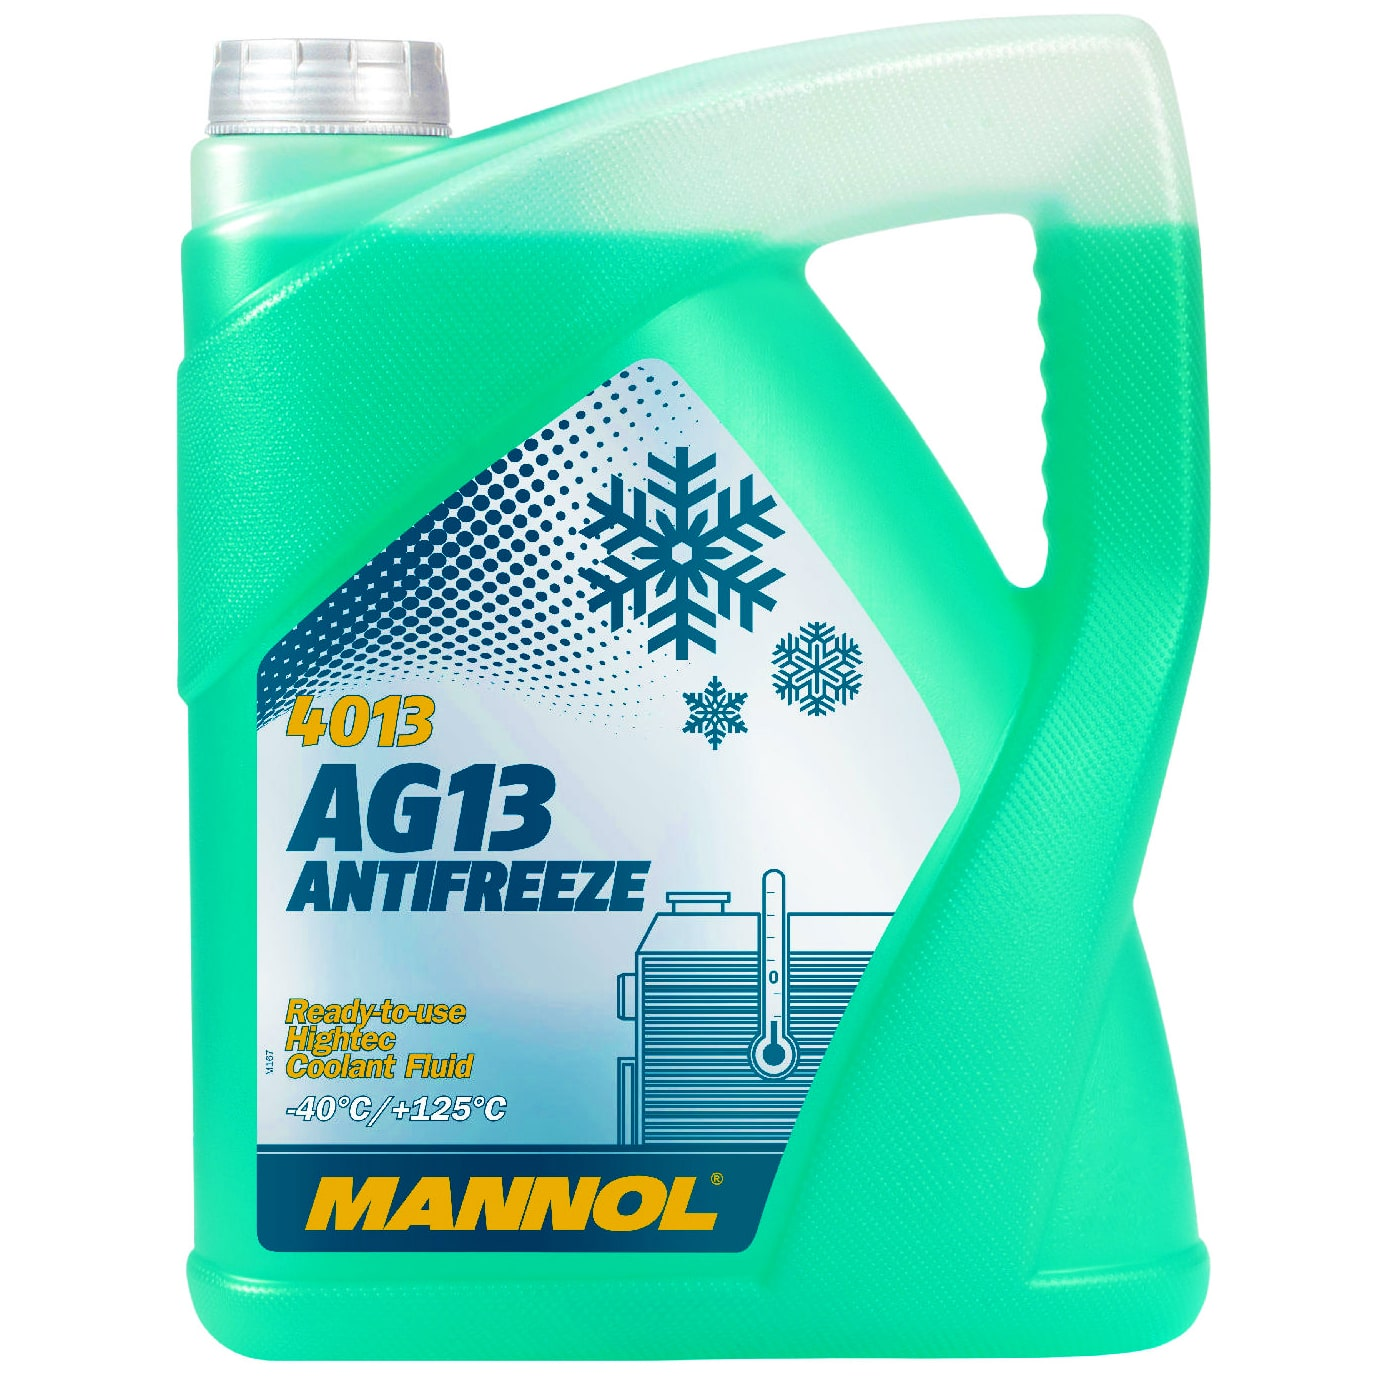 Kühlerfrostschutz Grün 5 L Mannol Antifreeze -40°C Kühlmittel BMW Ford Opel